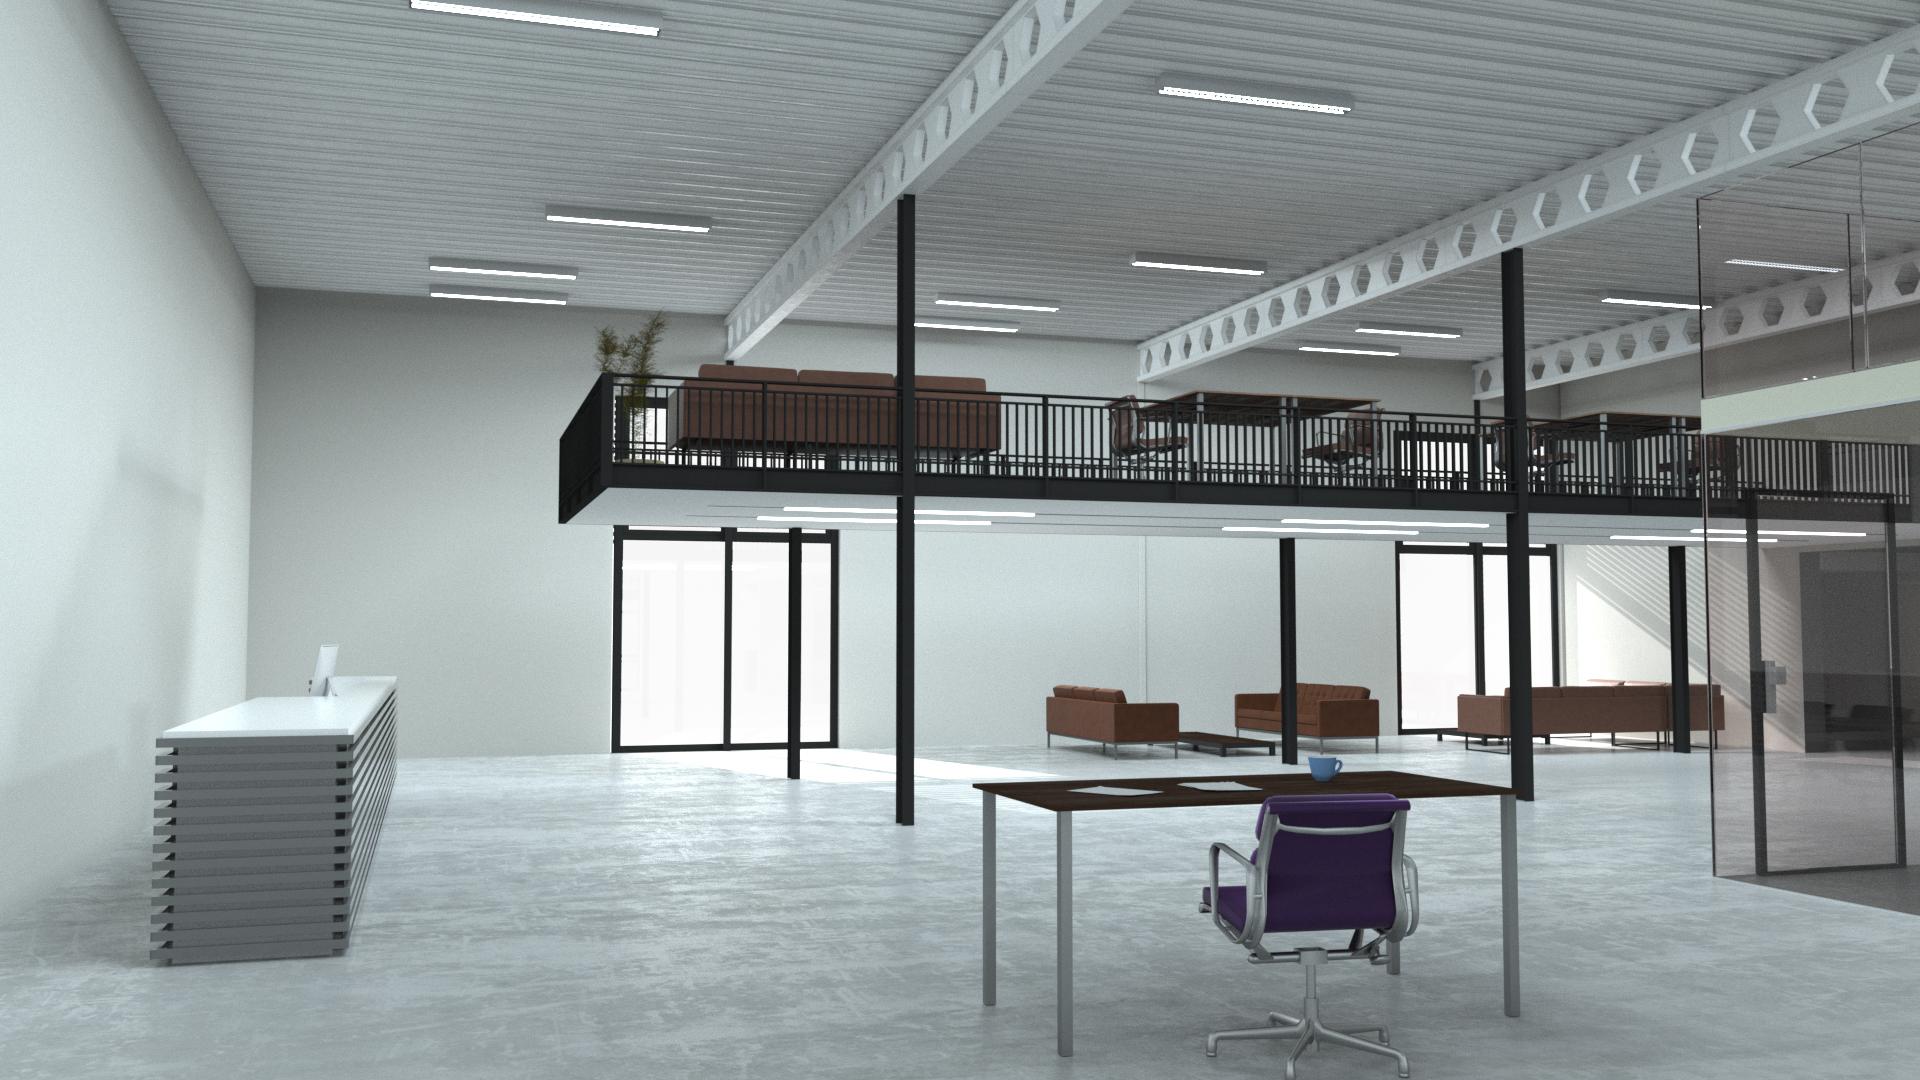 Hal_atelier_kantoor_optie2_00003.jpg